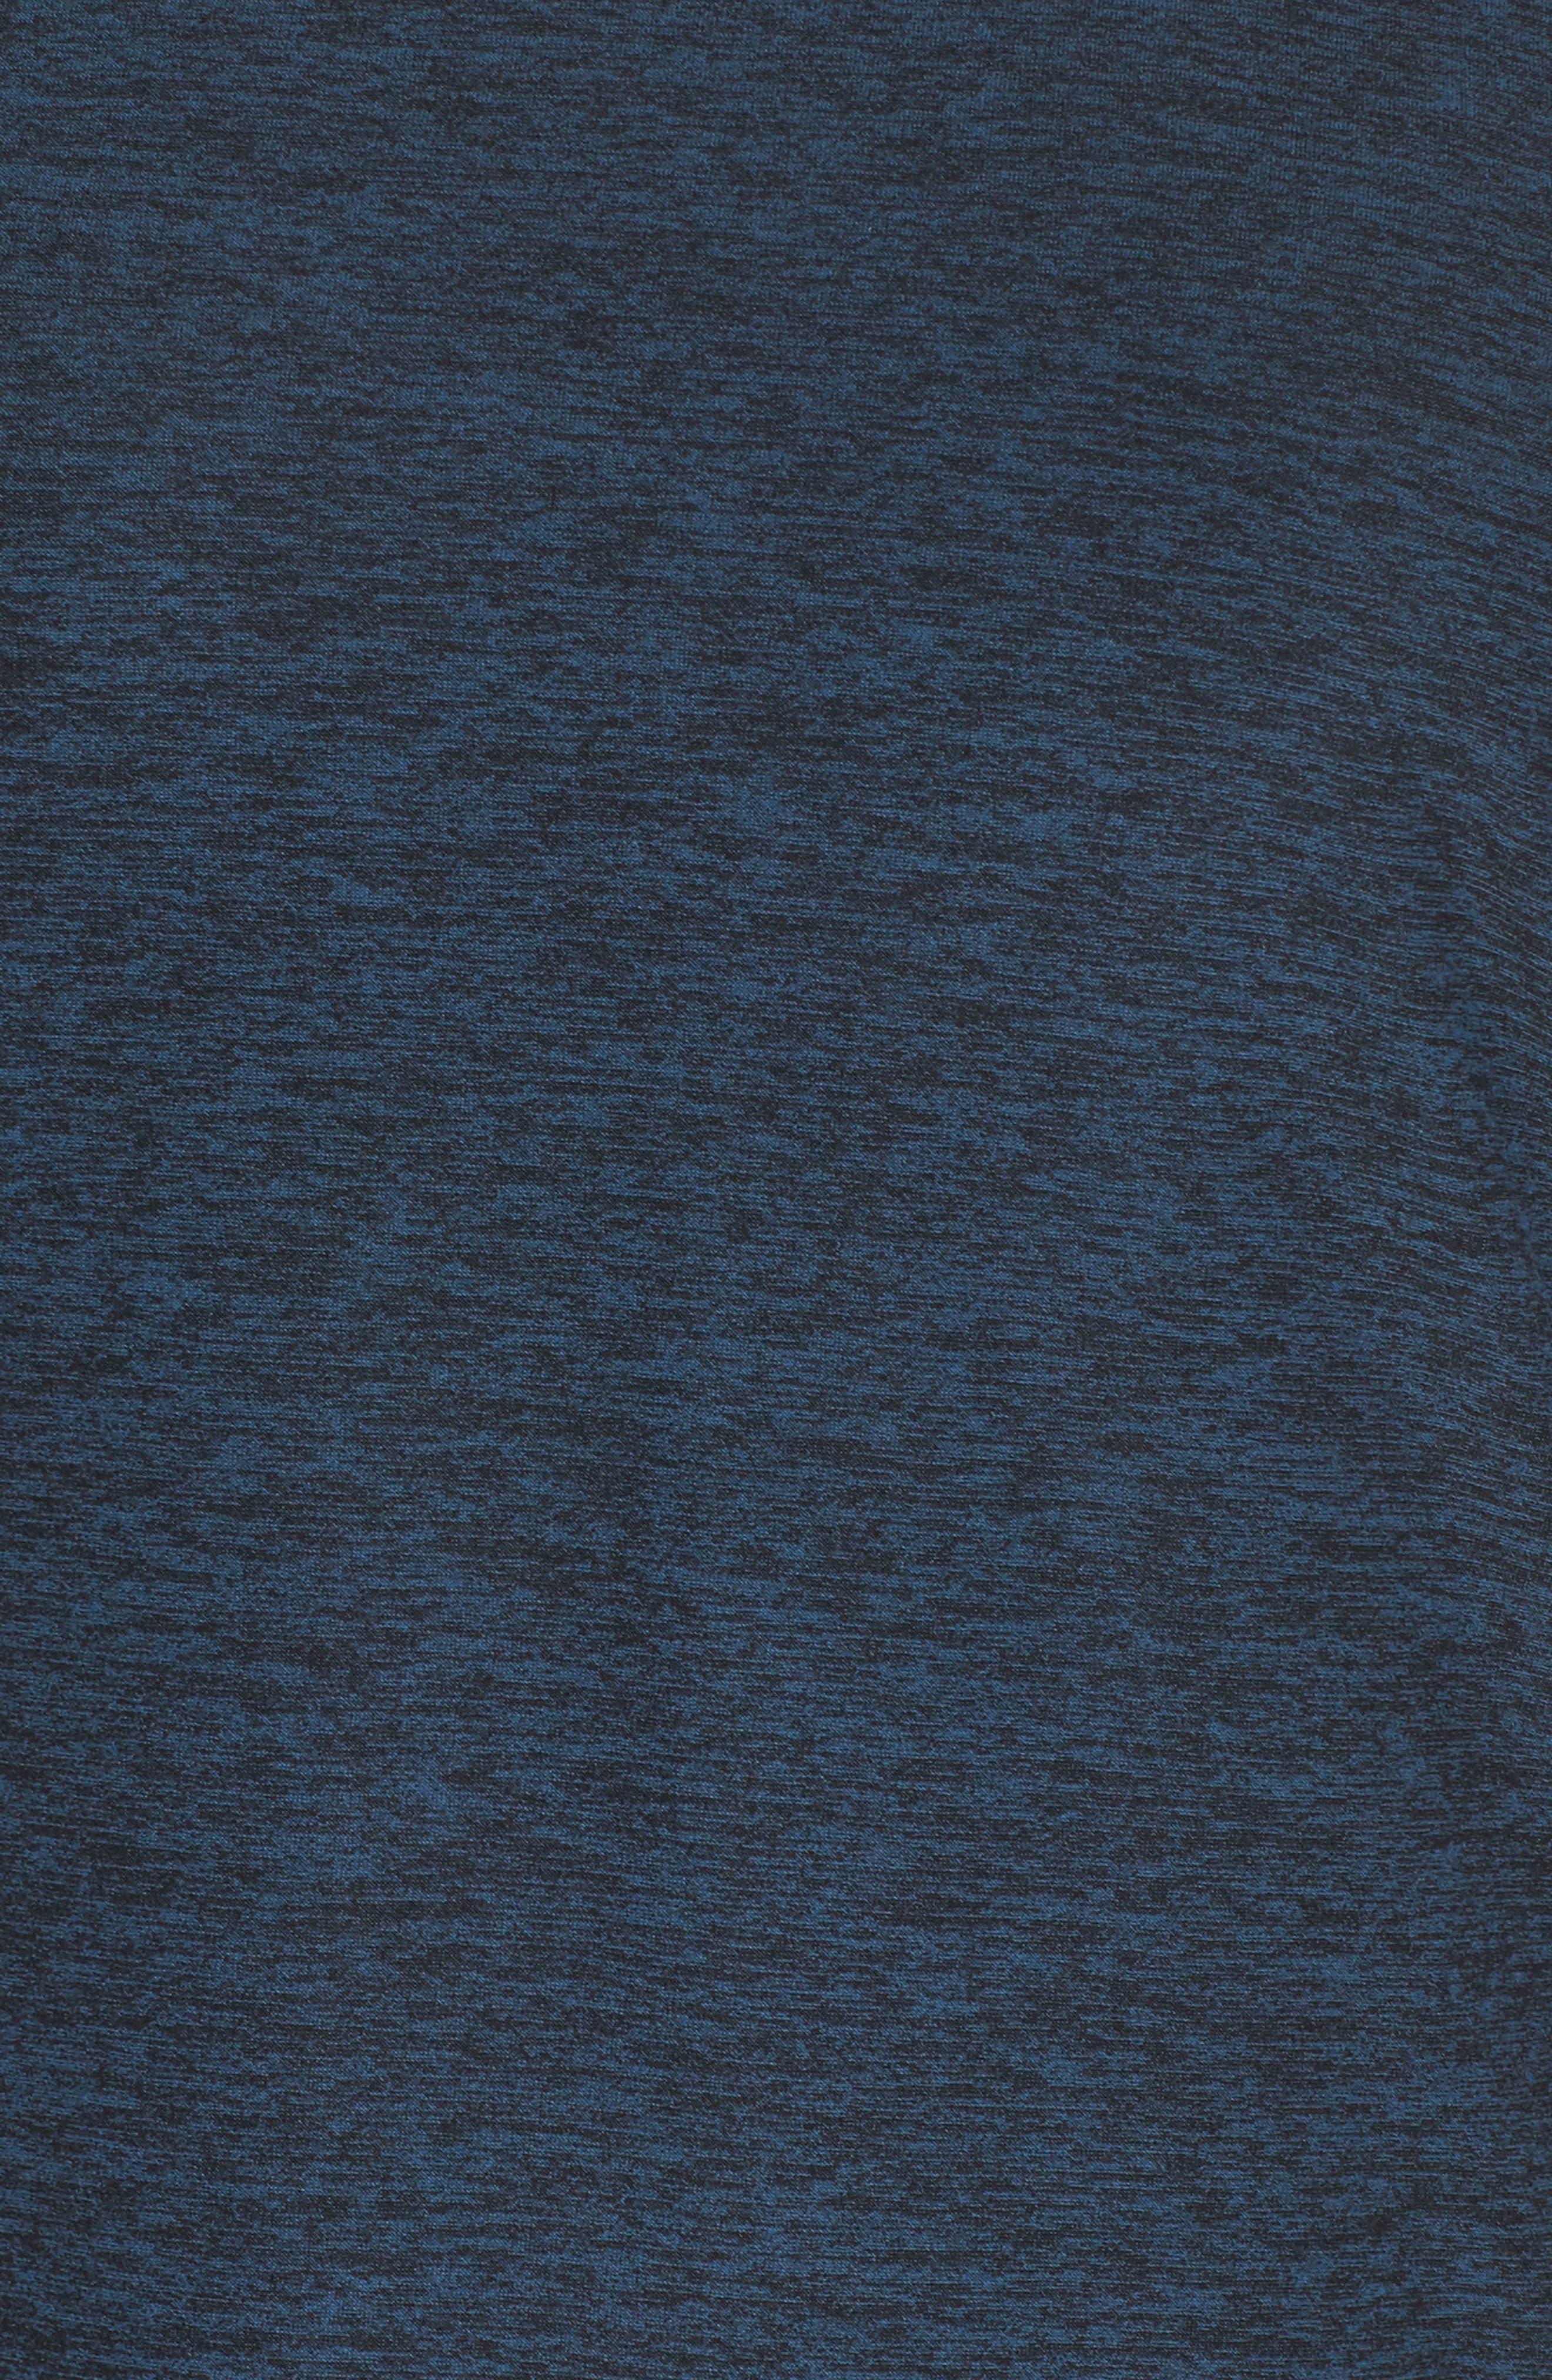 Weekend Traveler Pullover,                             Alternate thumbnail 6, color,                             Black- Deep Sapphire